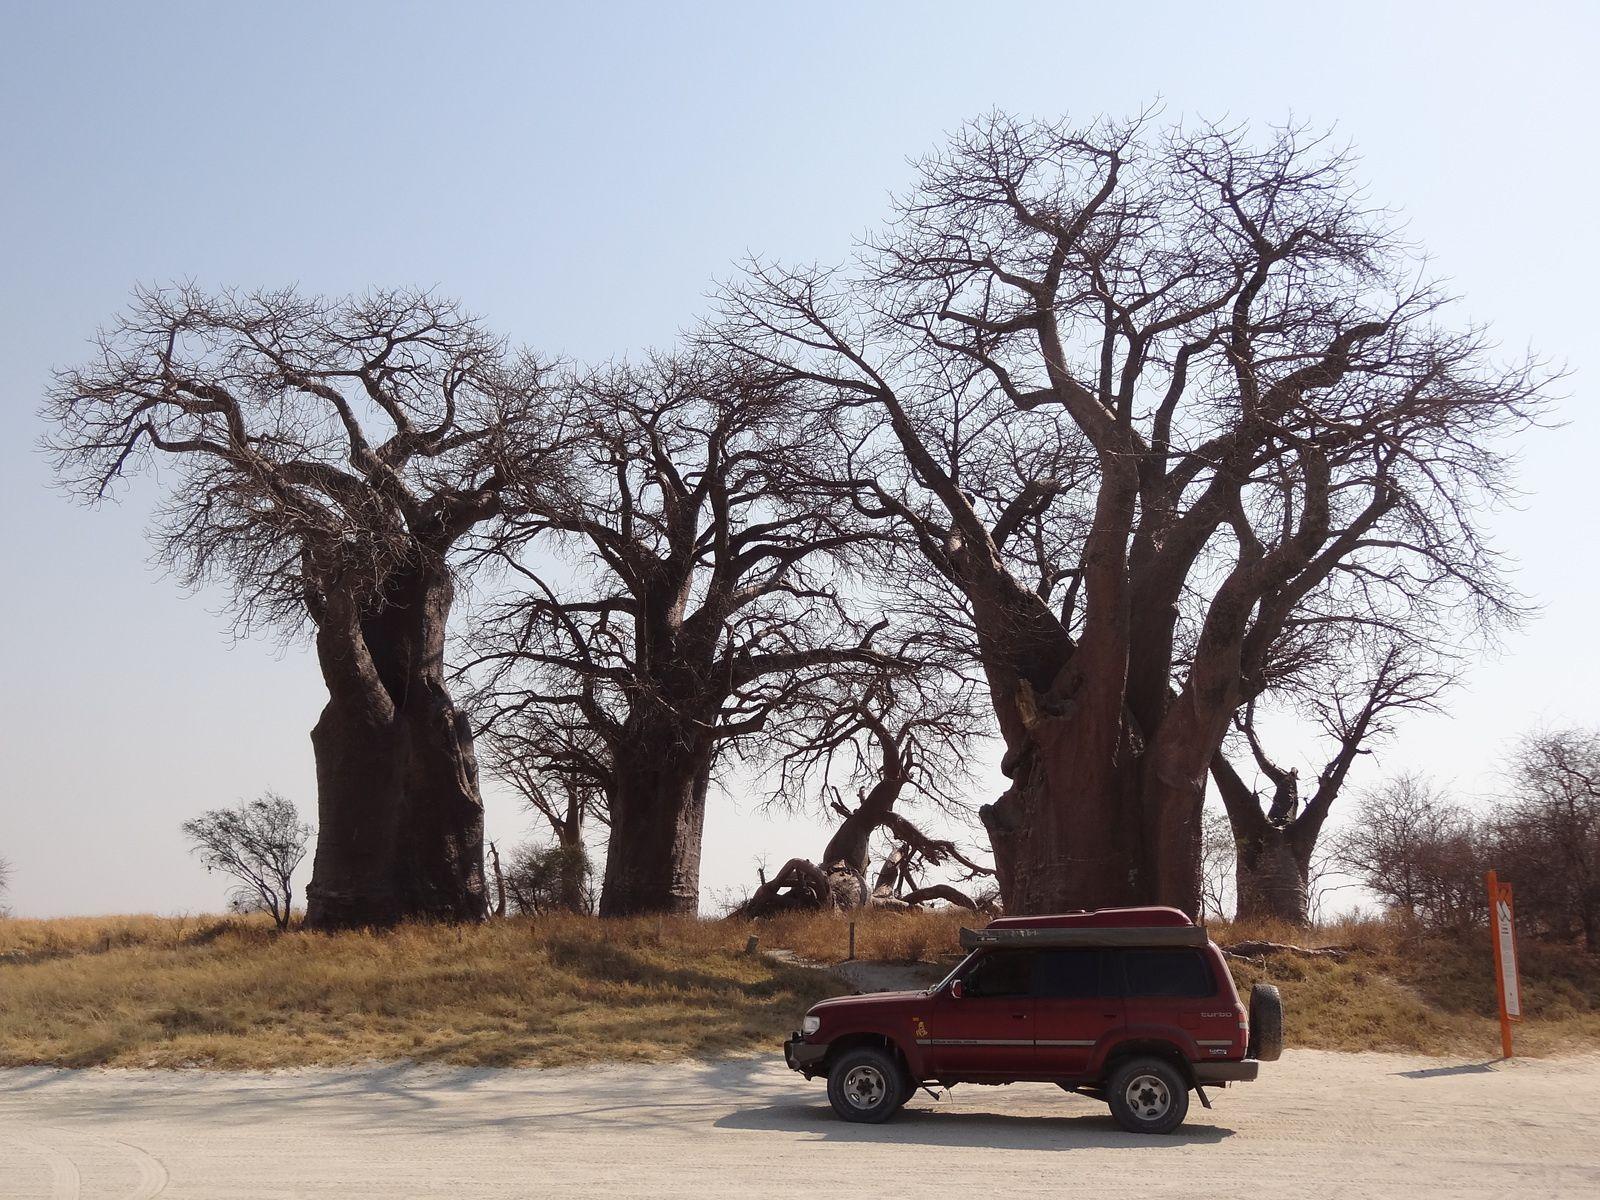 Acte 5.2 / Africa trip 2014 / Botswana - SA - Swaziland - SA